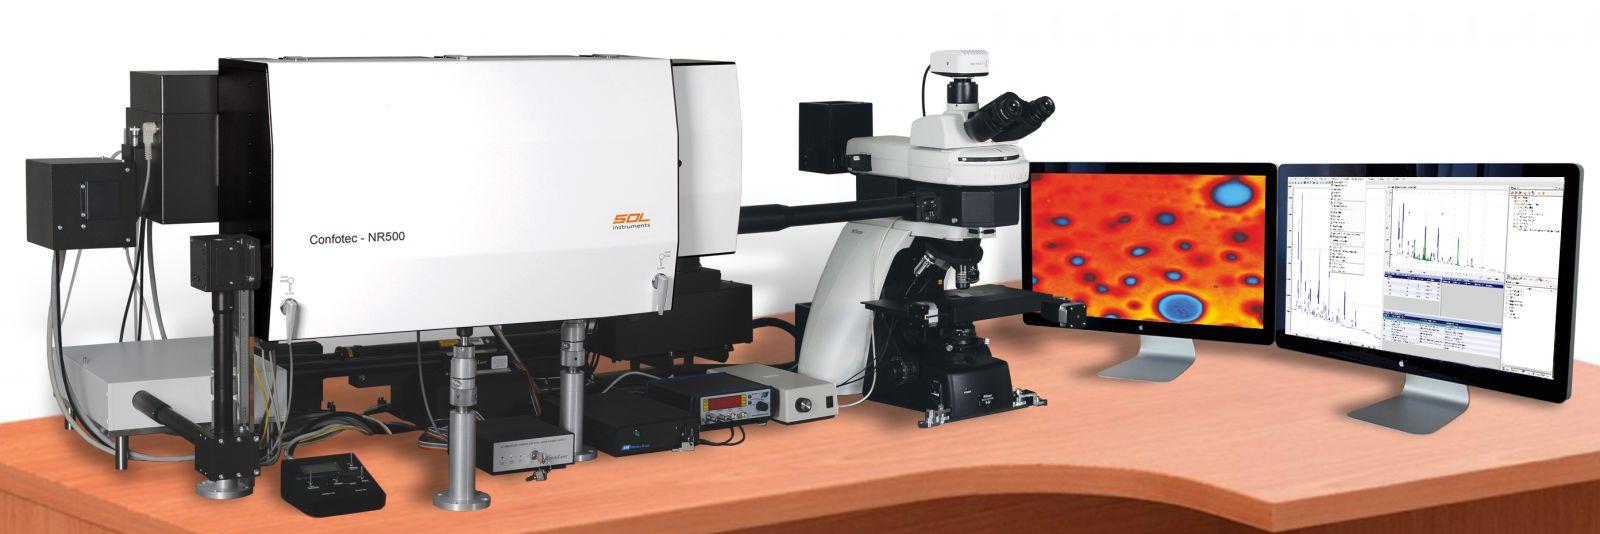 Confotec NR500 - 3D 掃描雷射拉曼共軛焦顯微鏡 3D Scanning Laser Raman Confocal Microscope Confotec® series NR500